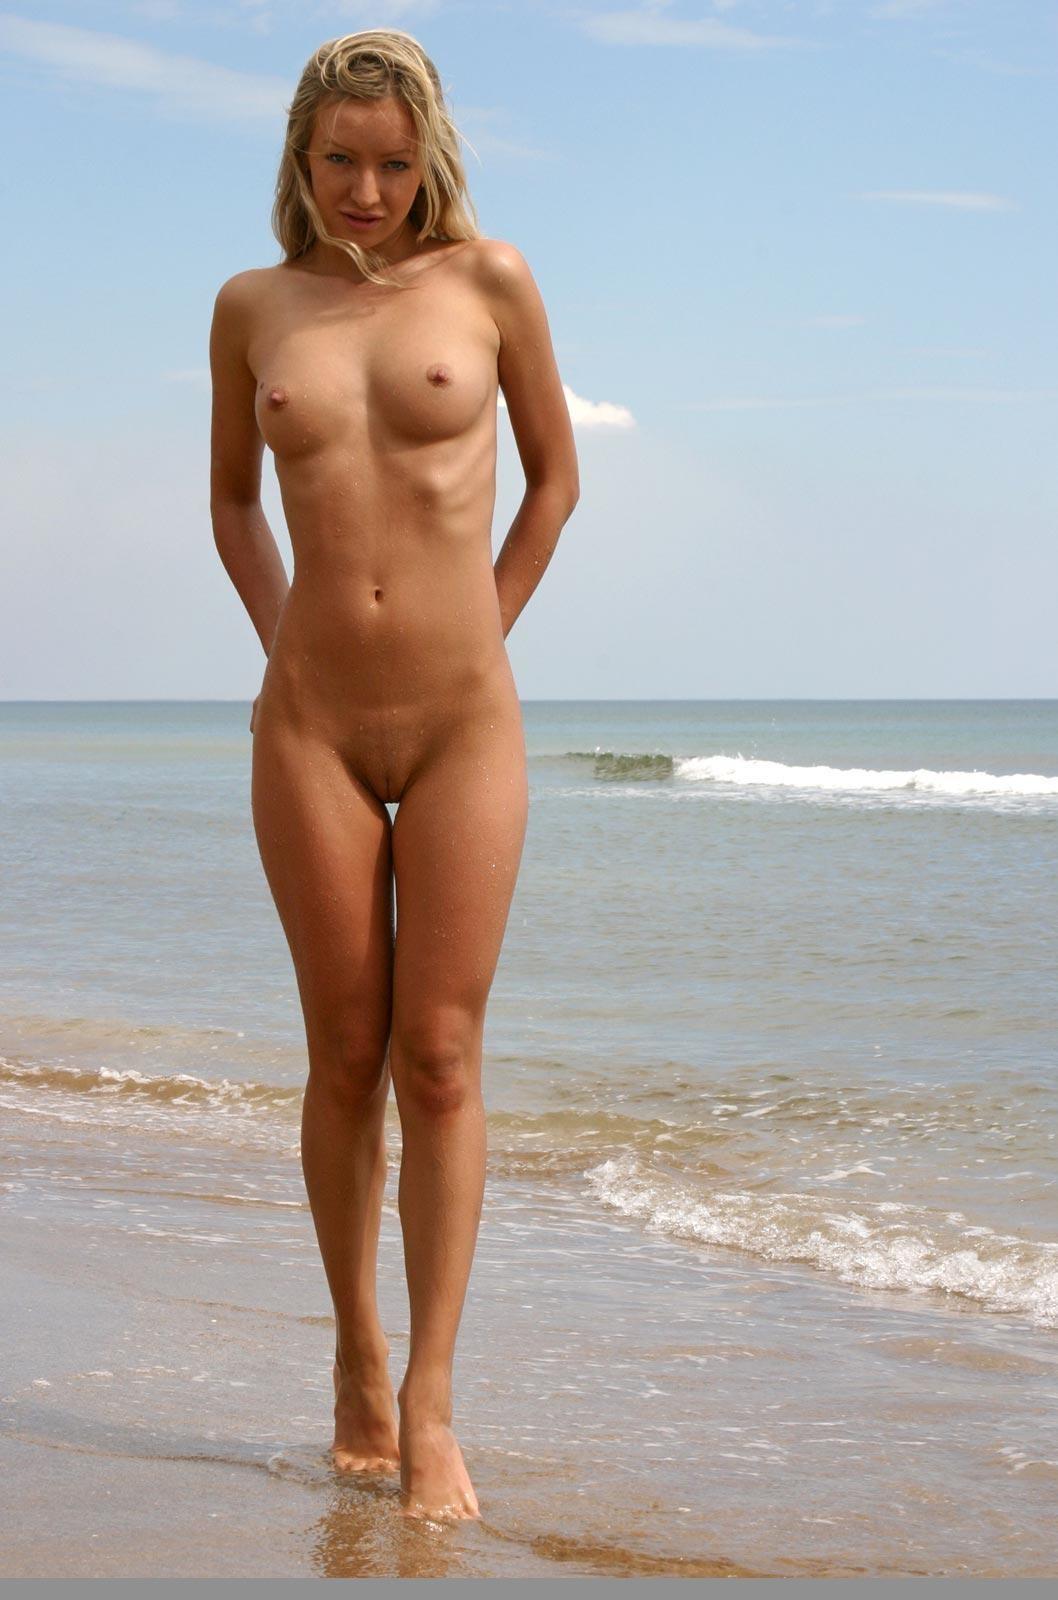 Голые Красивые 18-Летние Нудисточки На Пляже 60 Ххх Фото / Naked Beautiful Young Nudistochki On The Beach